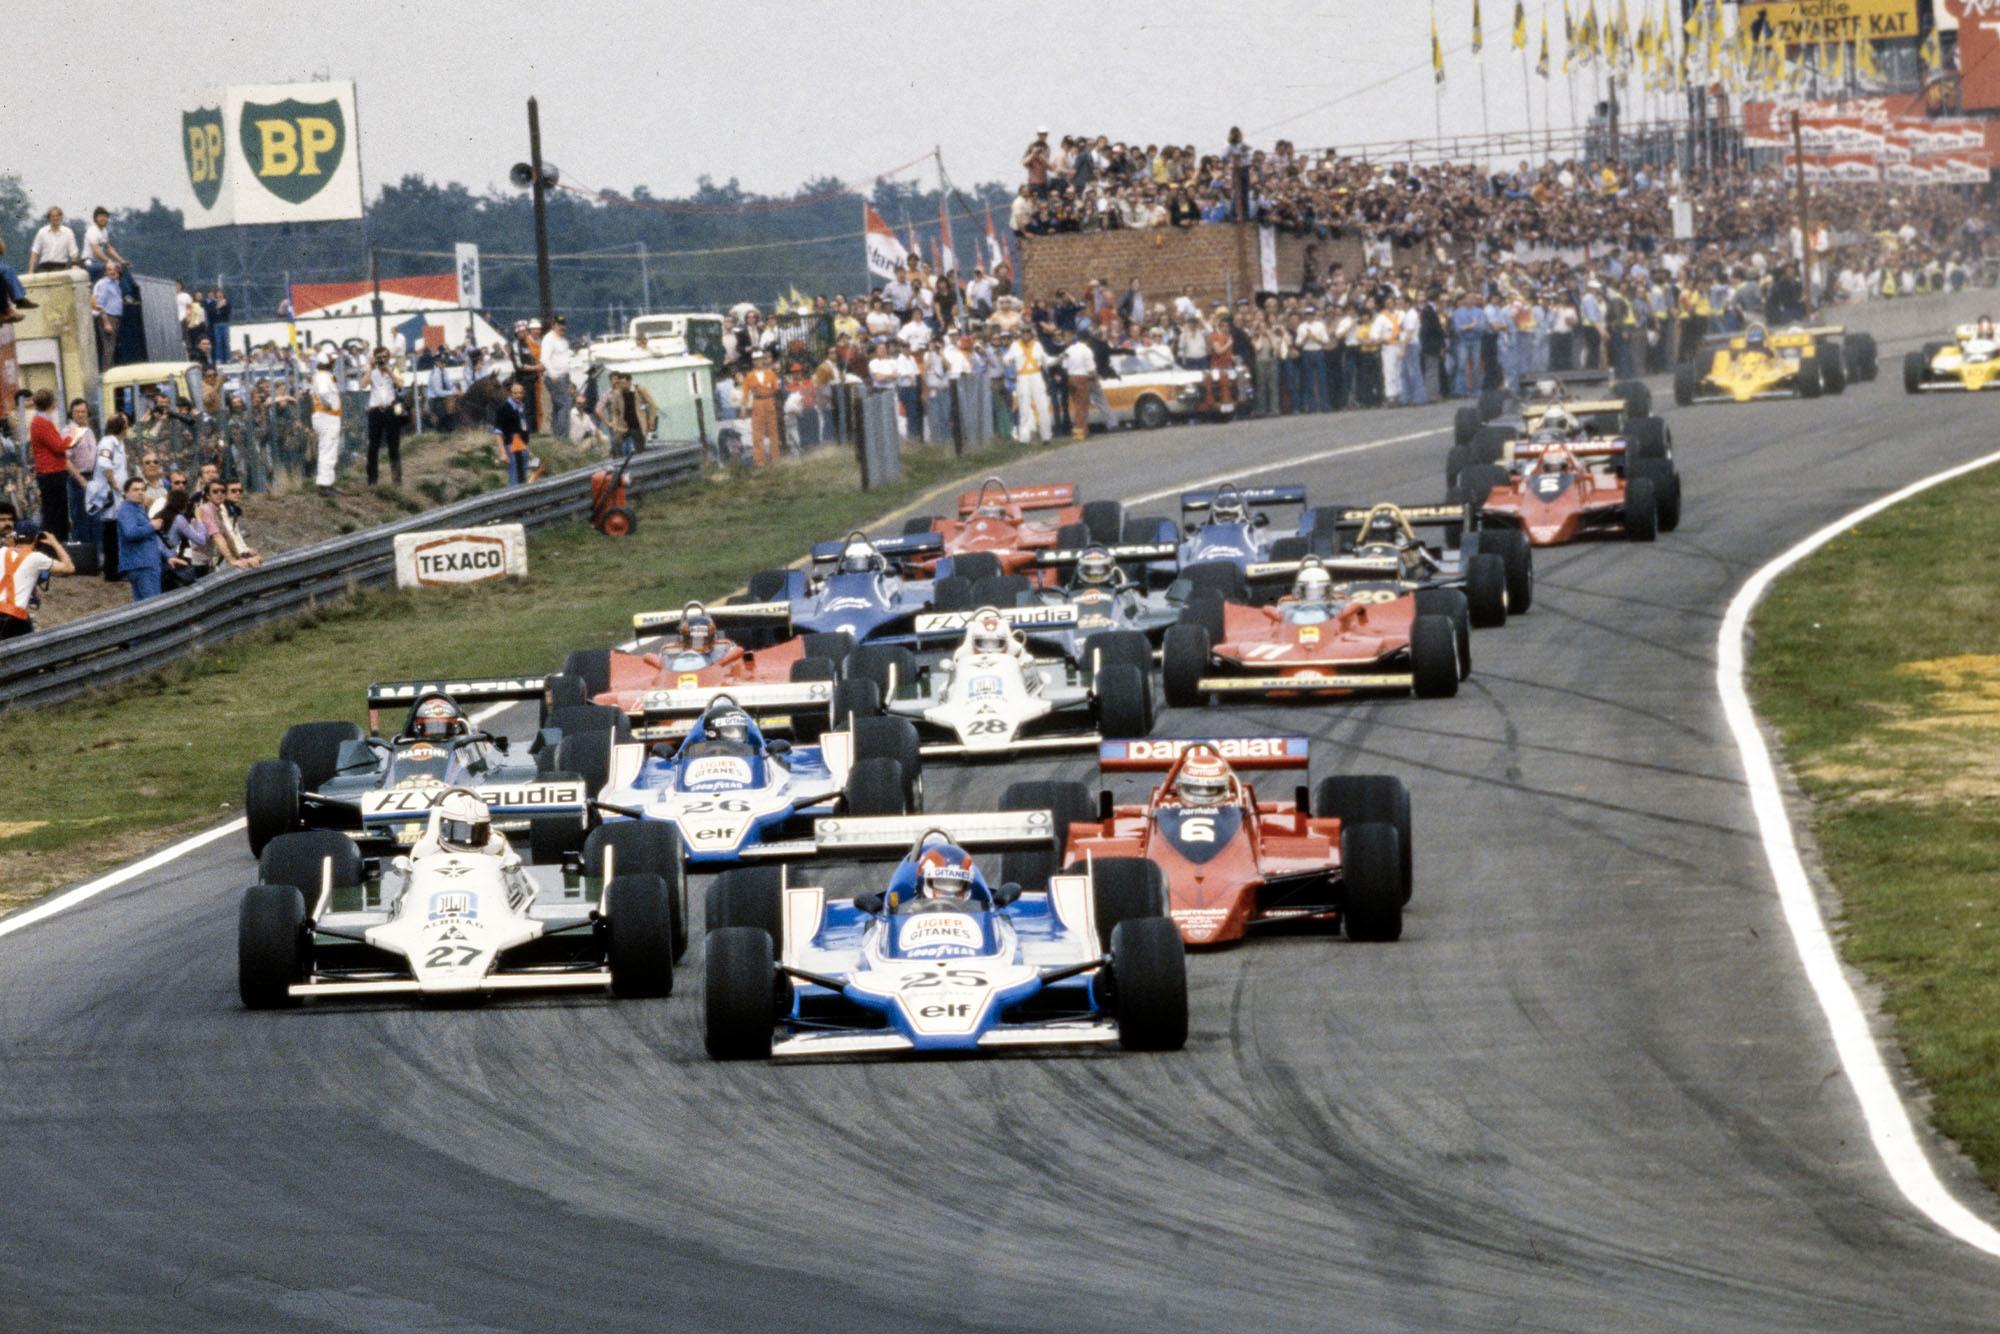 Patrick Depailler's Ligier leads the pack into the first corner, 1979 Belgian Grand Prix, Zolder.